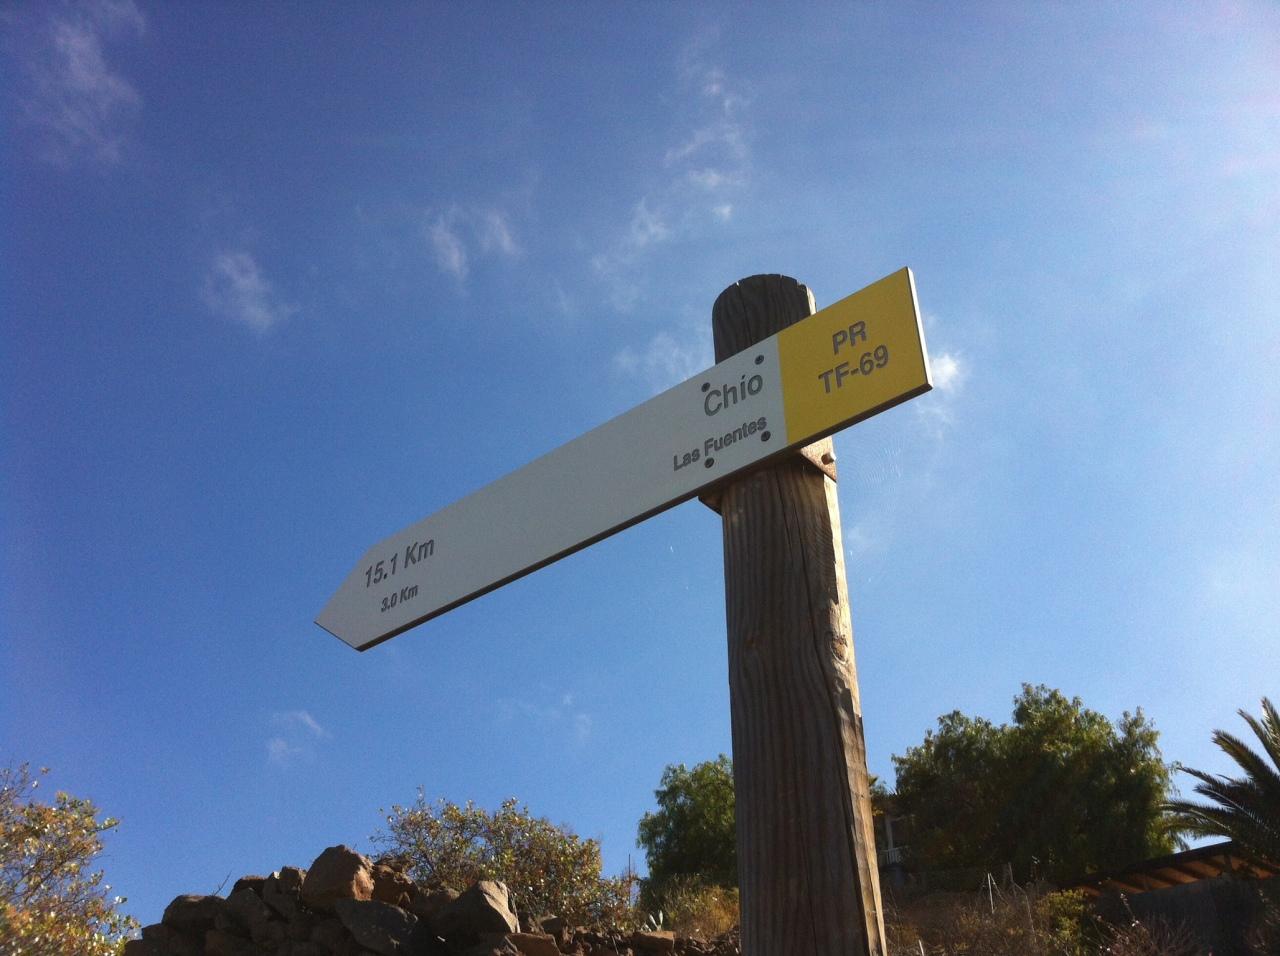 Walking signage. [Photo by me, 2016.]